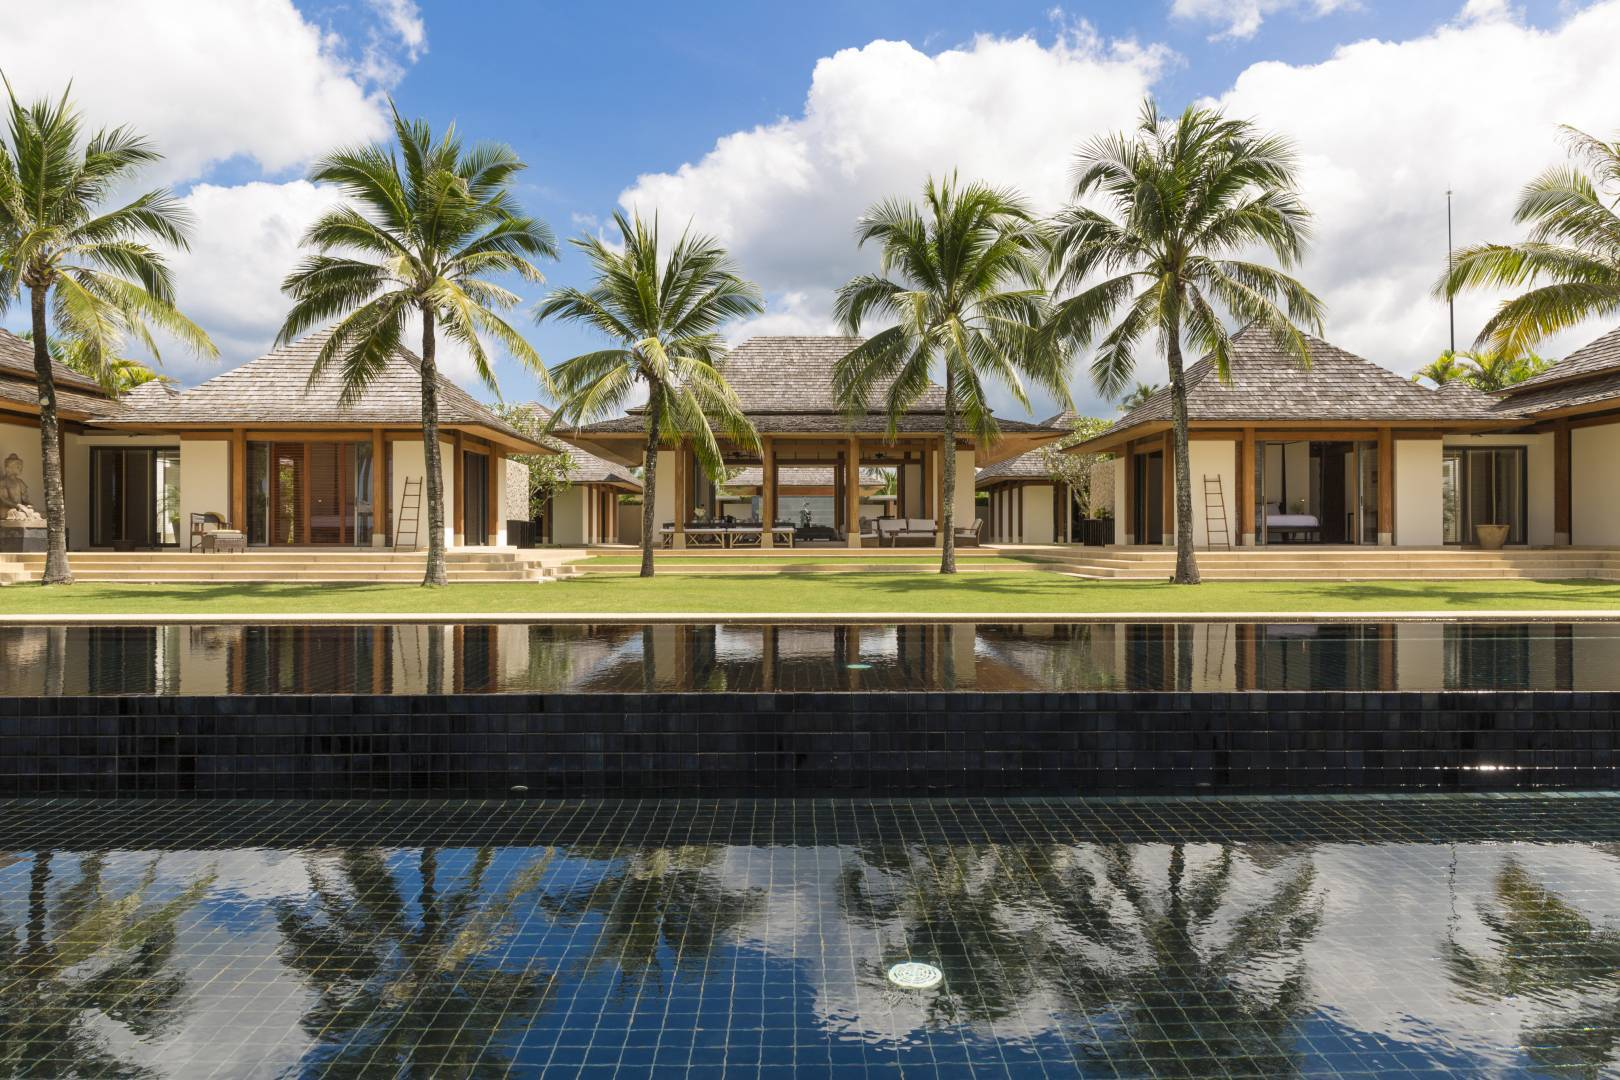 Shanti Villa, a luxury 6 bedroom beach front villa located in Jivana private estate, Phang Nga, Thailand